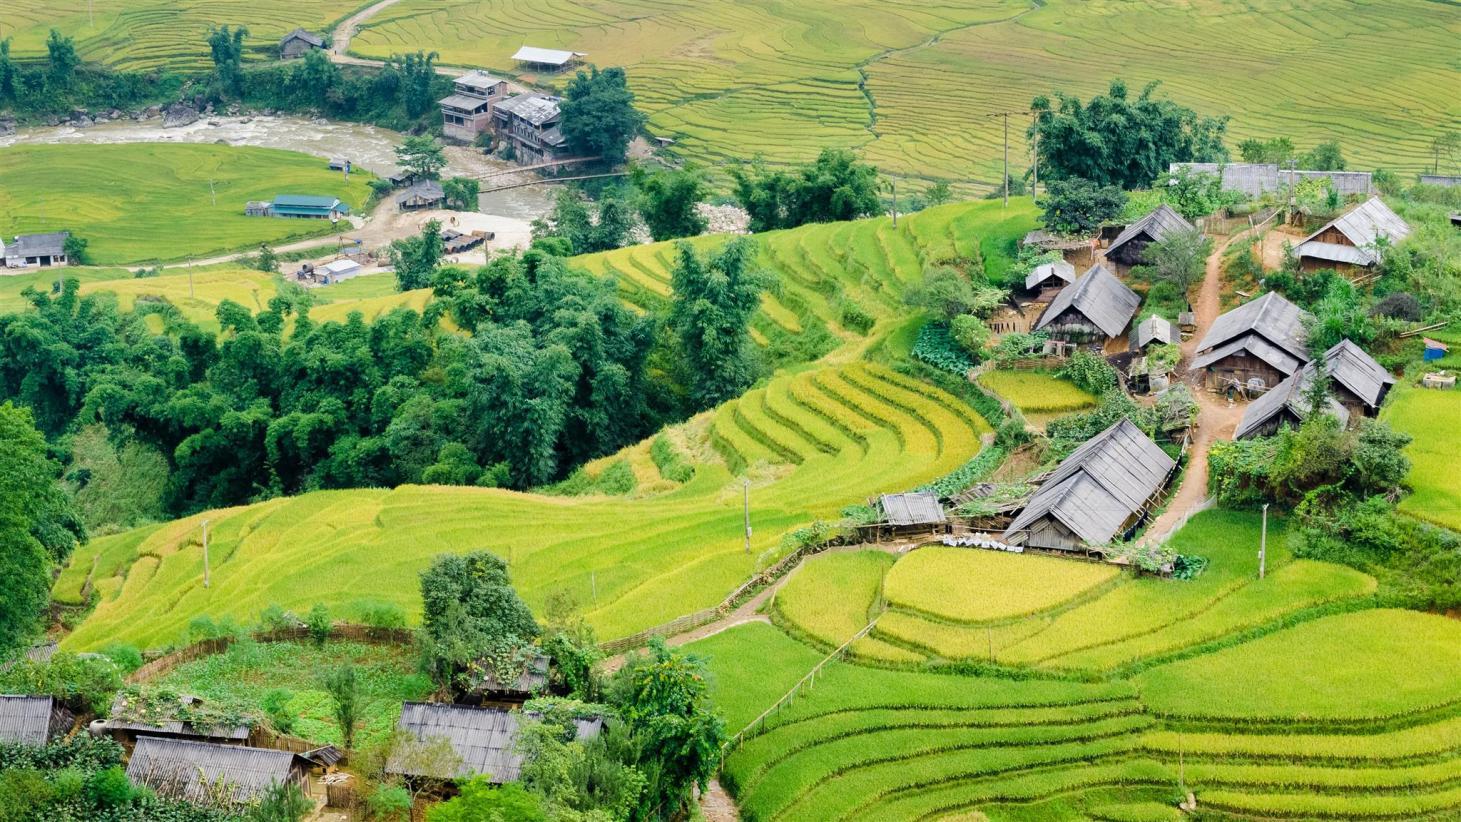 Où voyager au Vietnam baie d'halong sapa